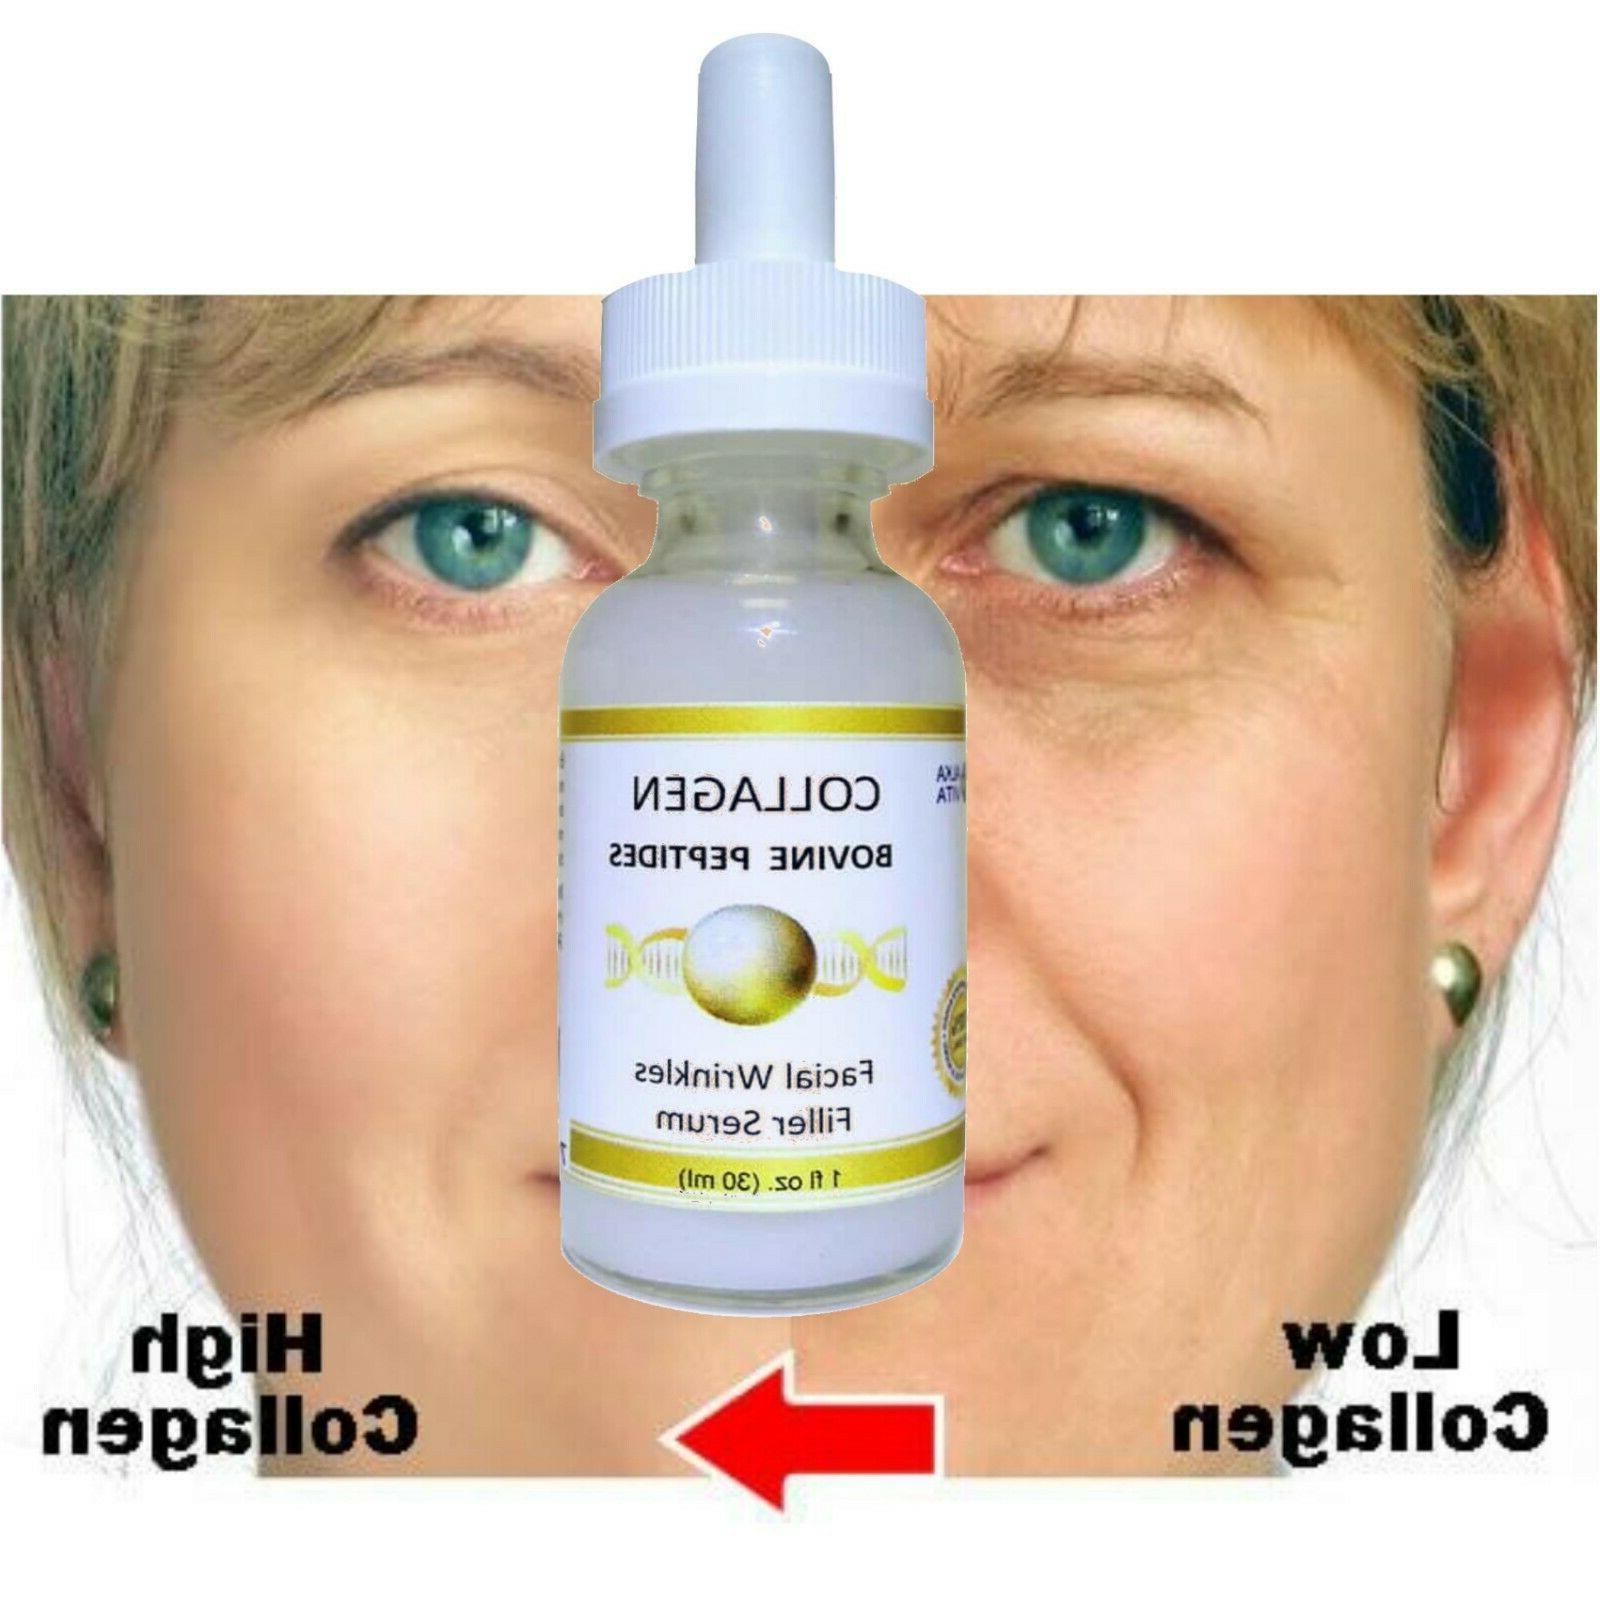 COLLAGEN PEPTIDES Wrinkles Filler Hydrolyzed Bovine Grade ALKAVITA